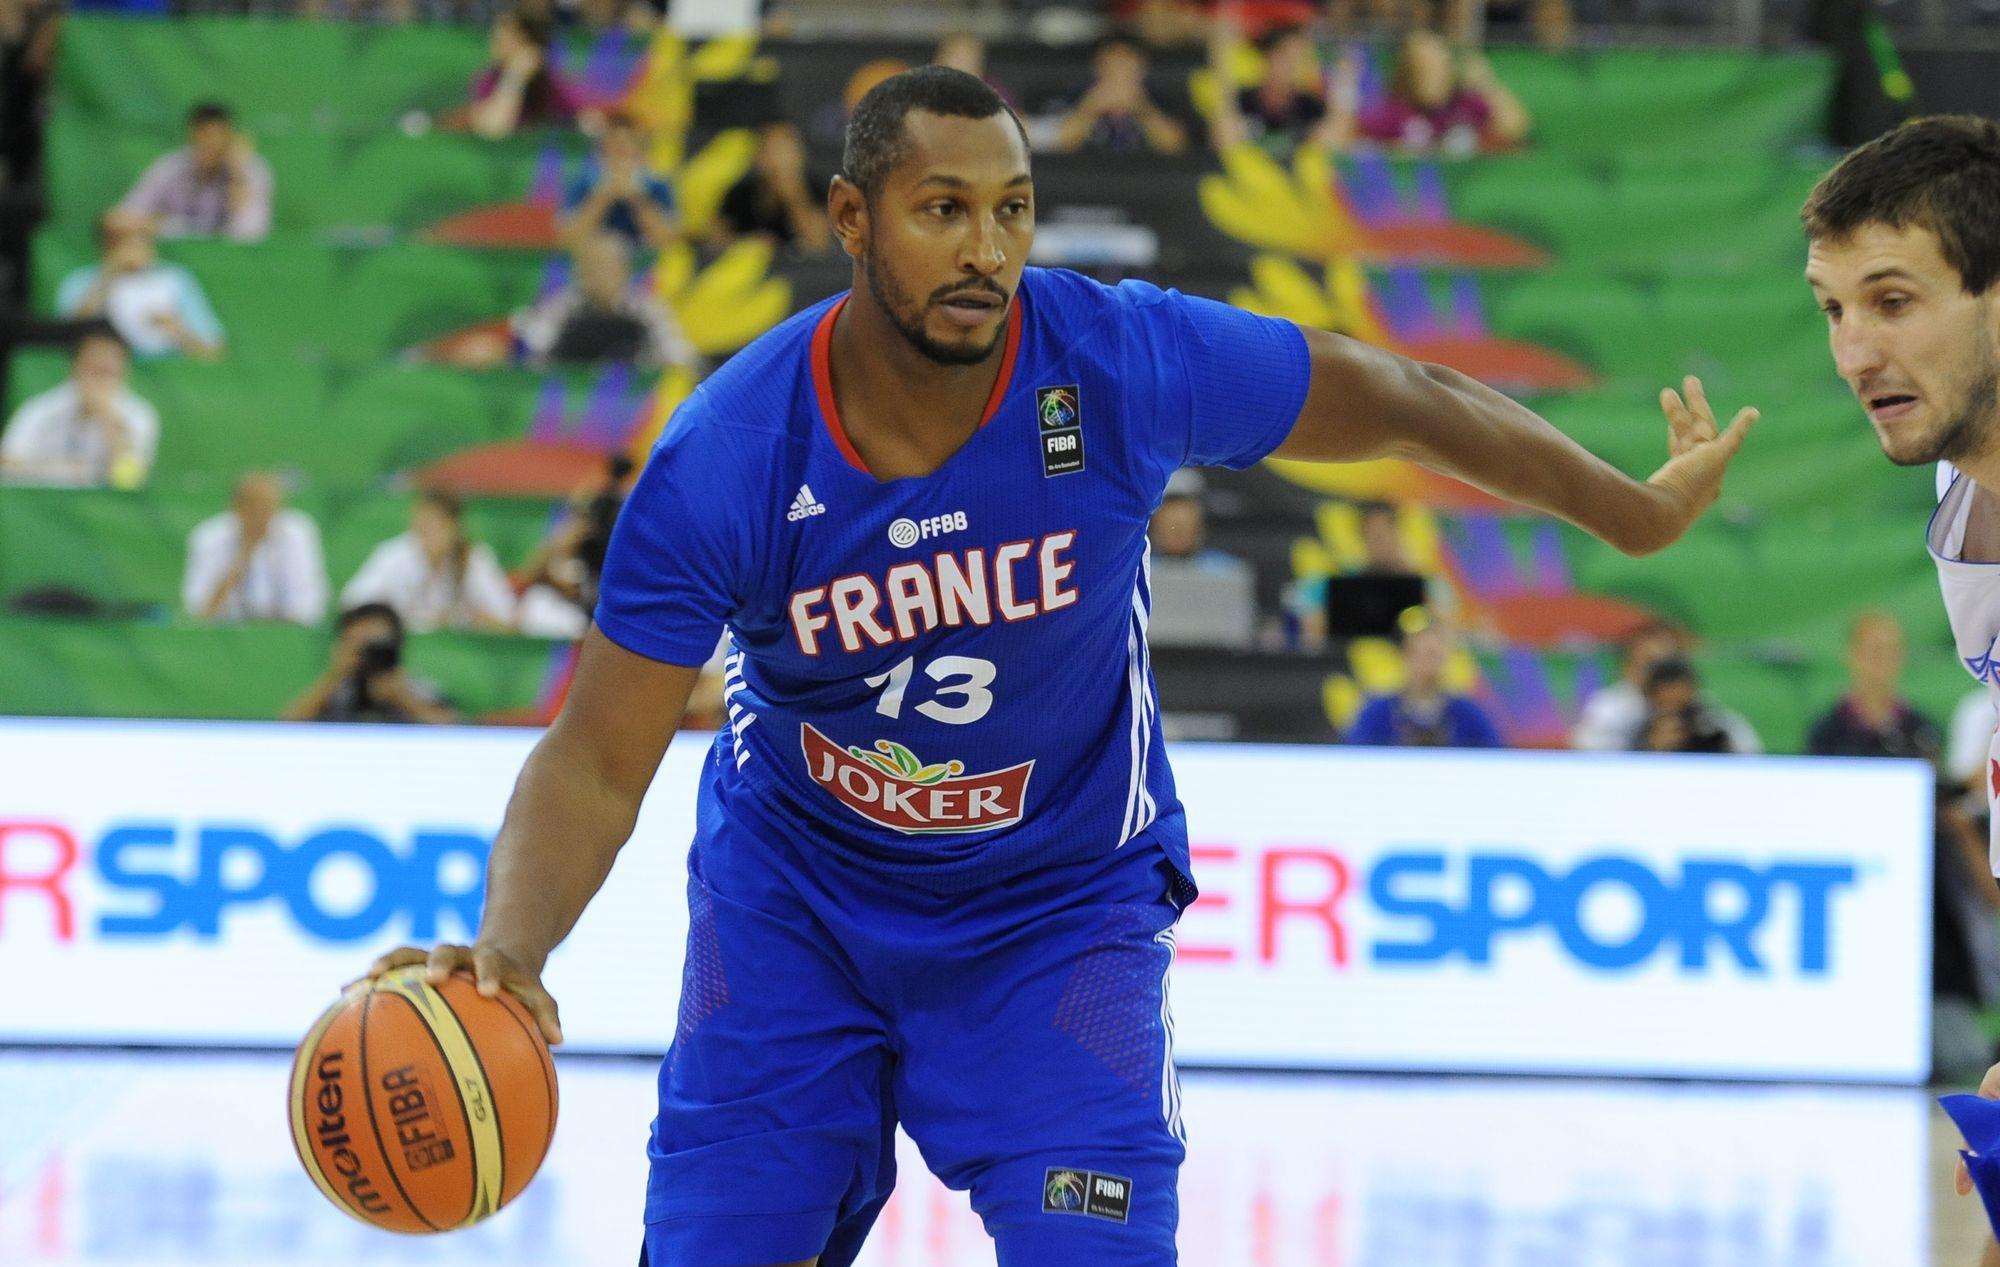 Basket - Equipe de France - Mondial de basket : France - Serbie en direct